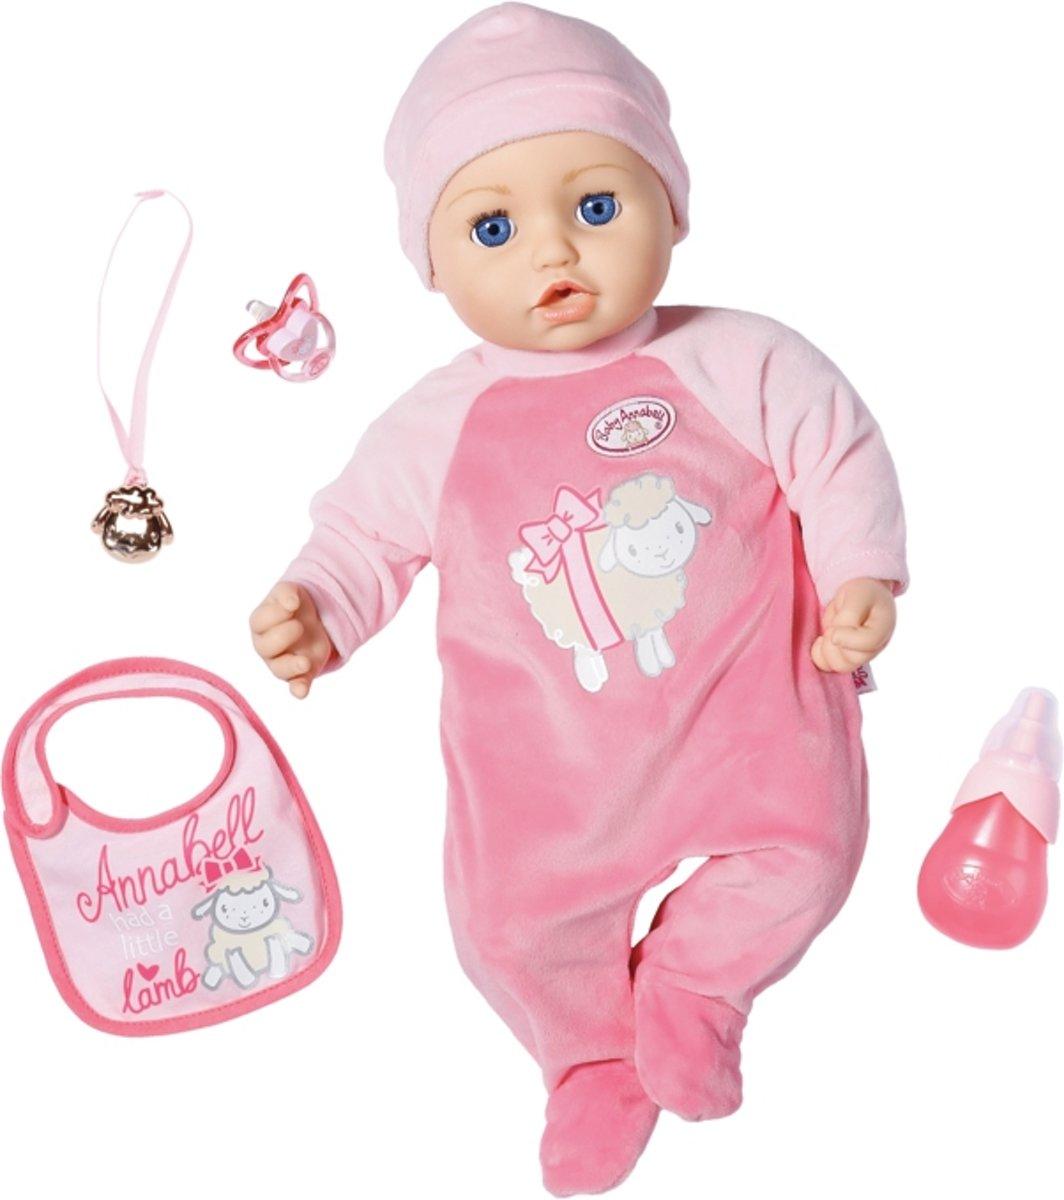 Baby Annabell Annabell 43cm